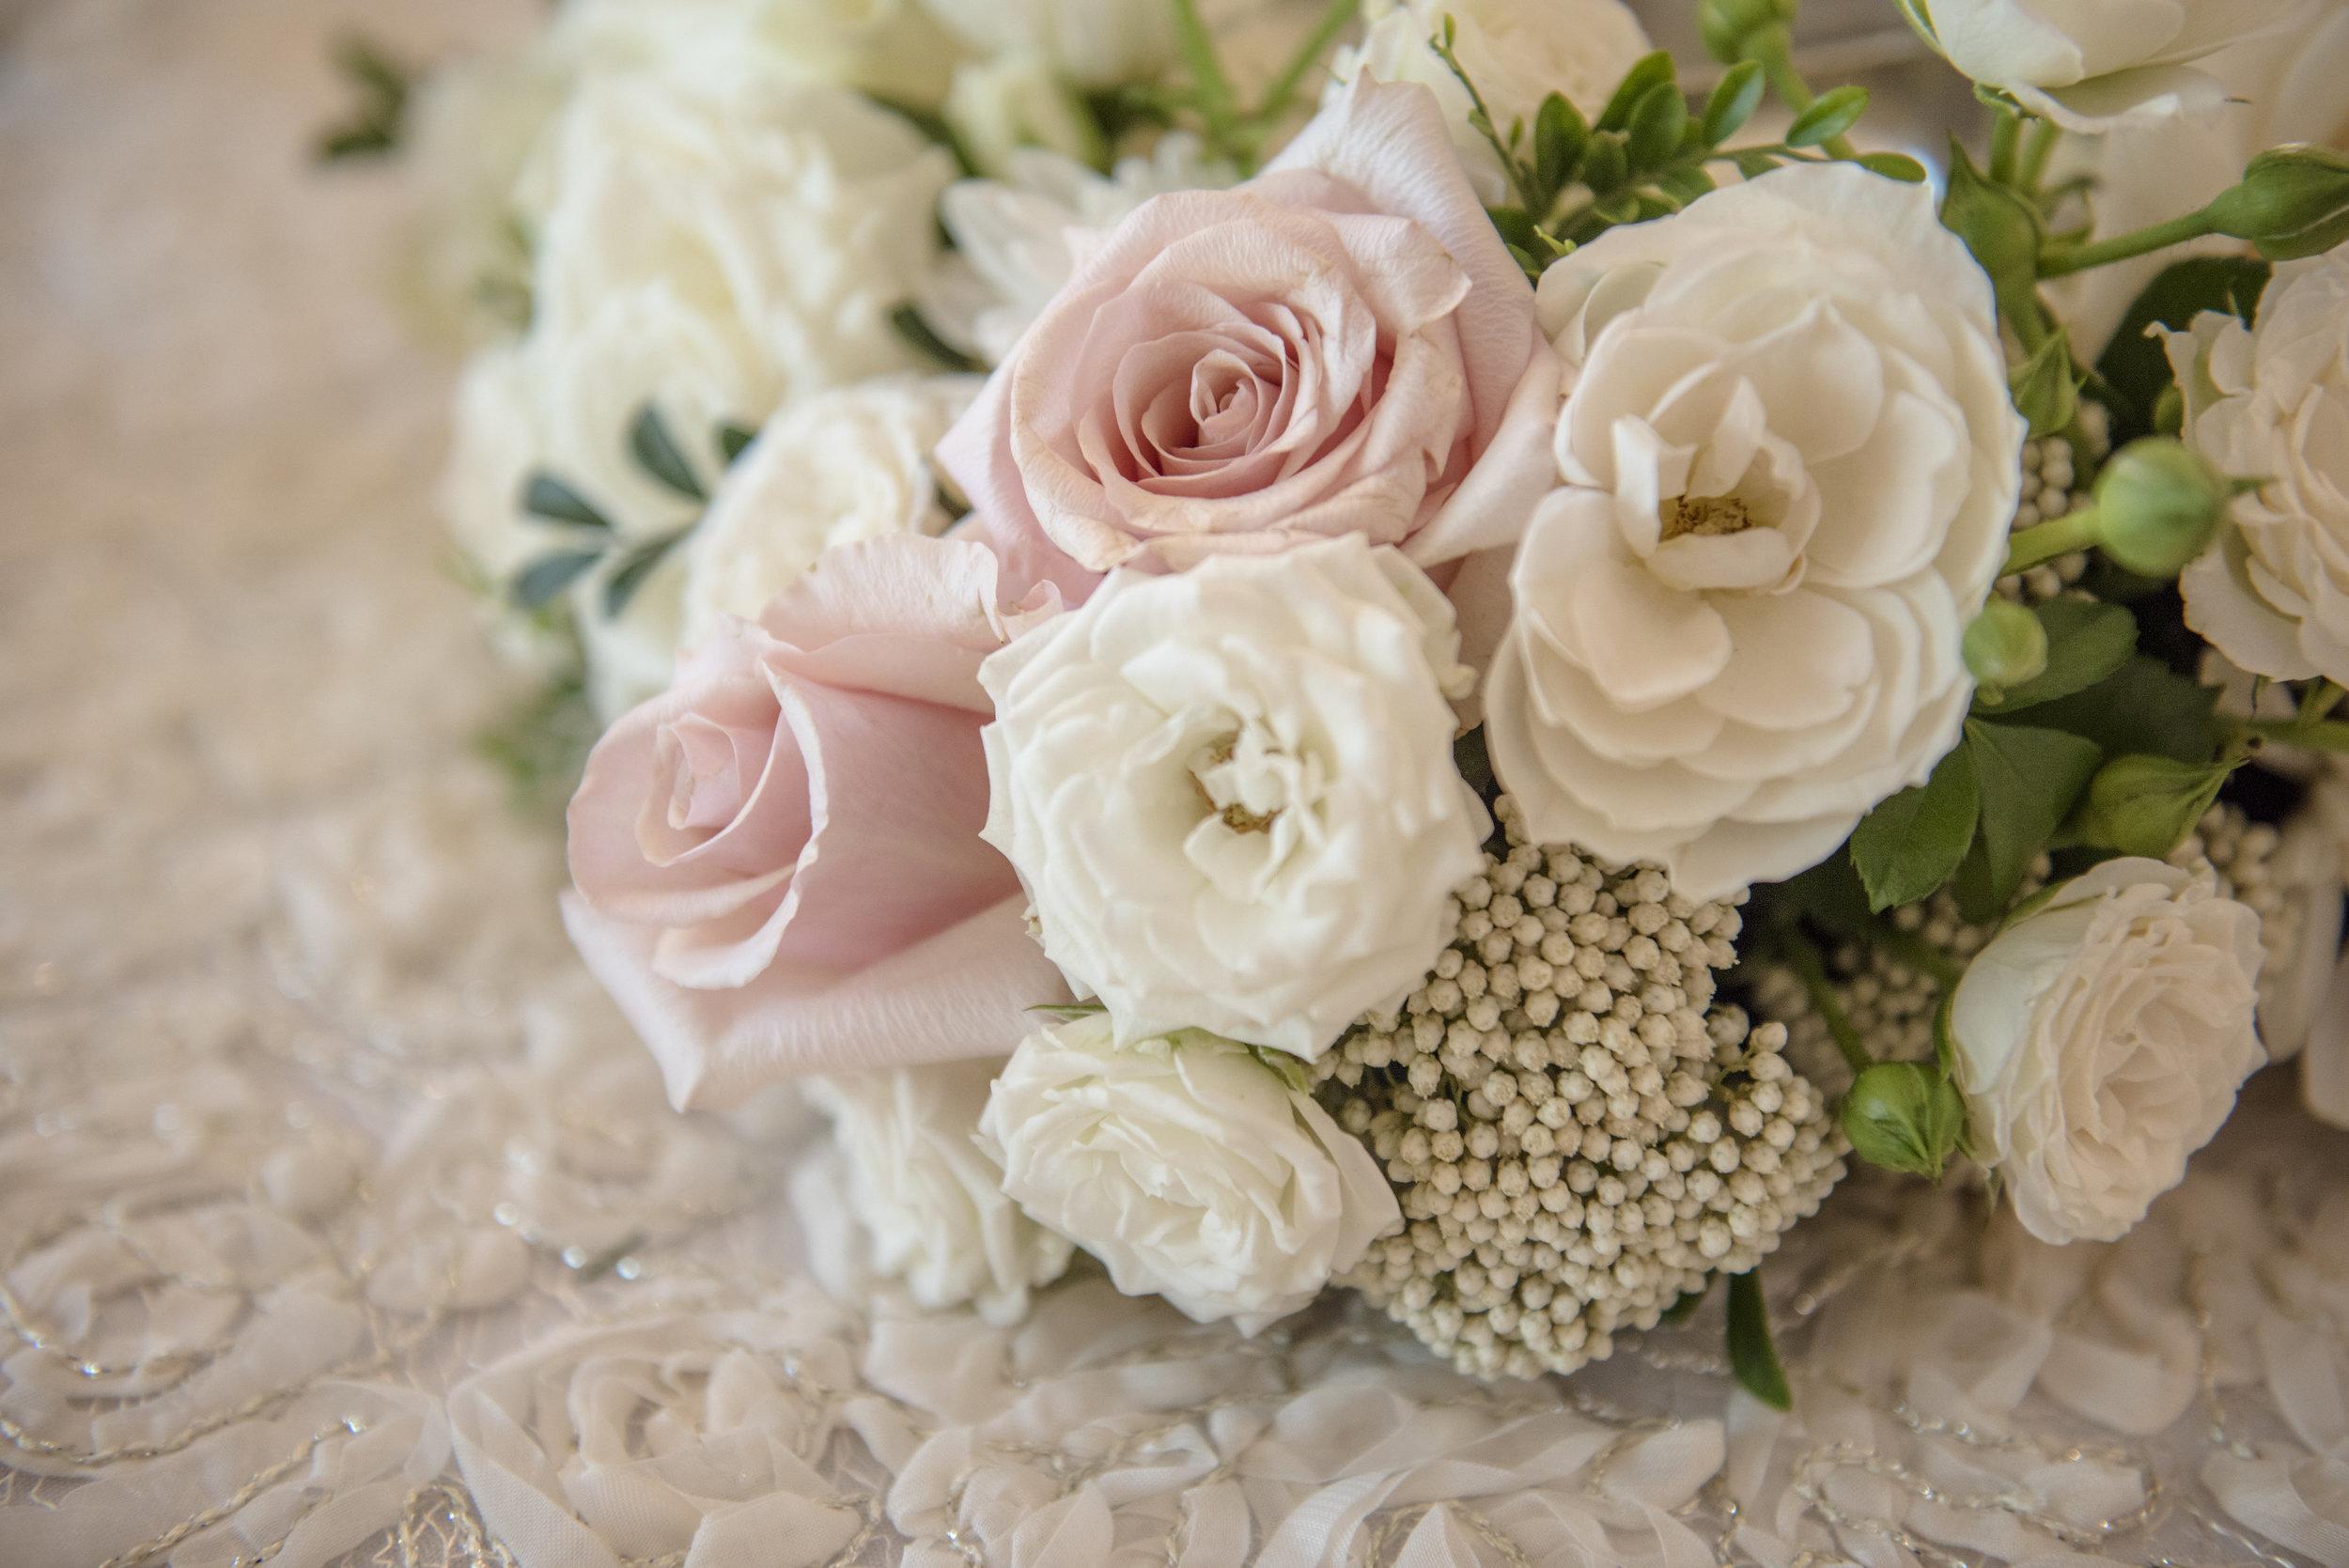 Hire_Ivory_rose_luxury_linen_sydney_wedding_decor_event_Versace_Decor_closeup_flowers_pink_white 2.jpg